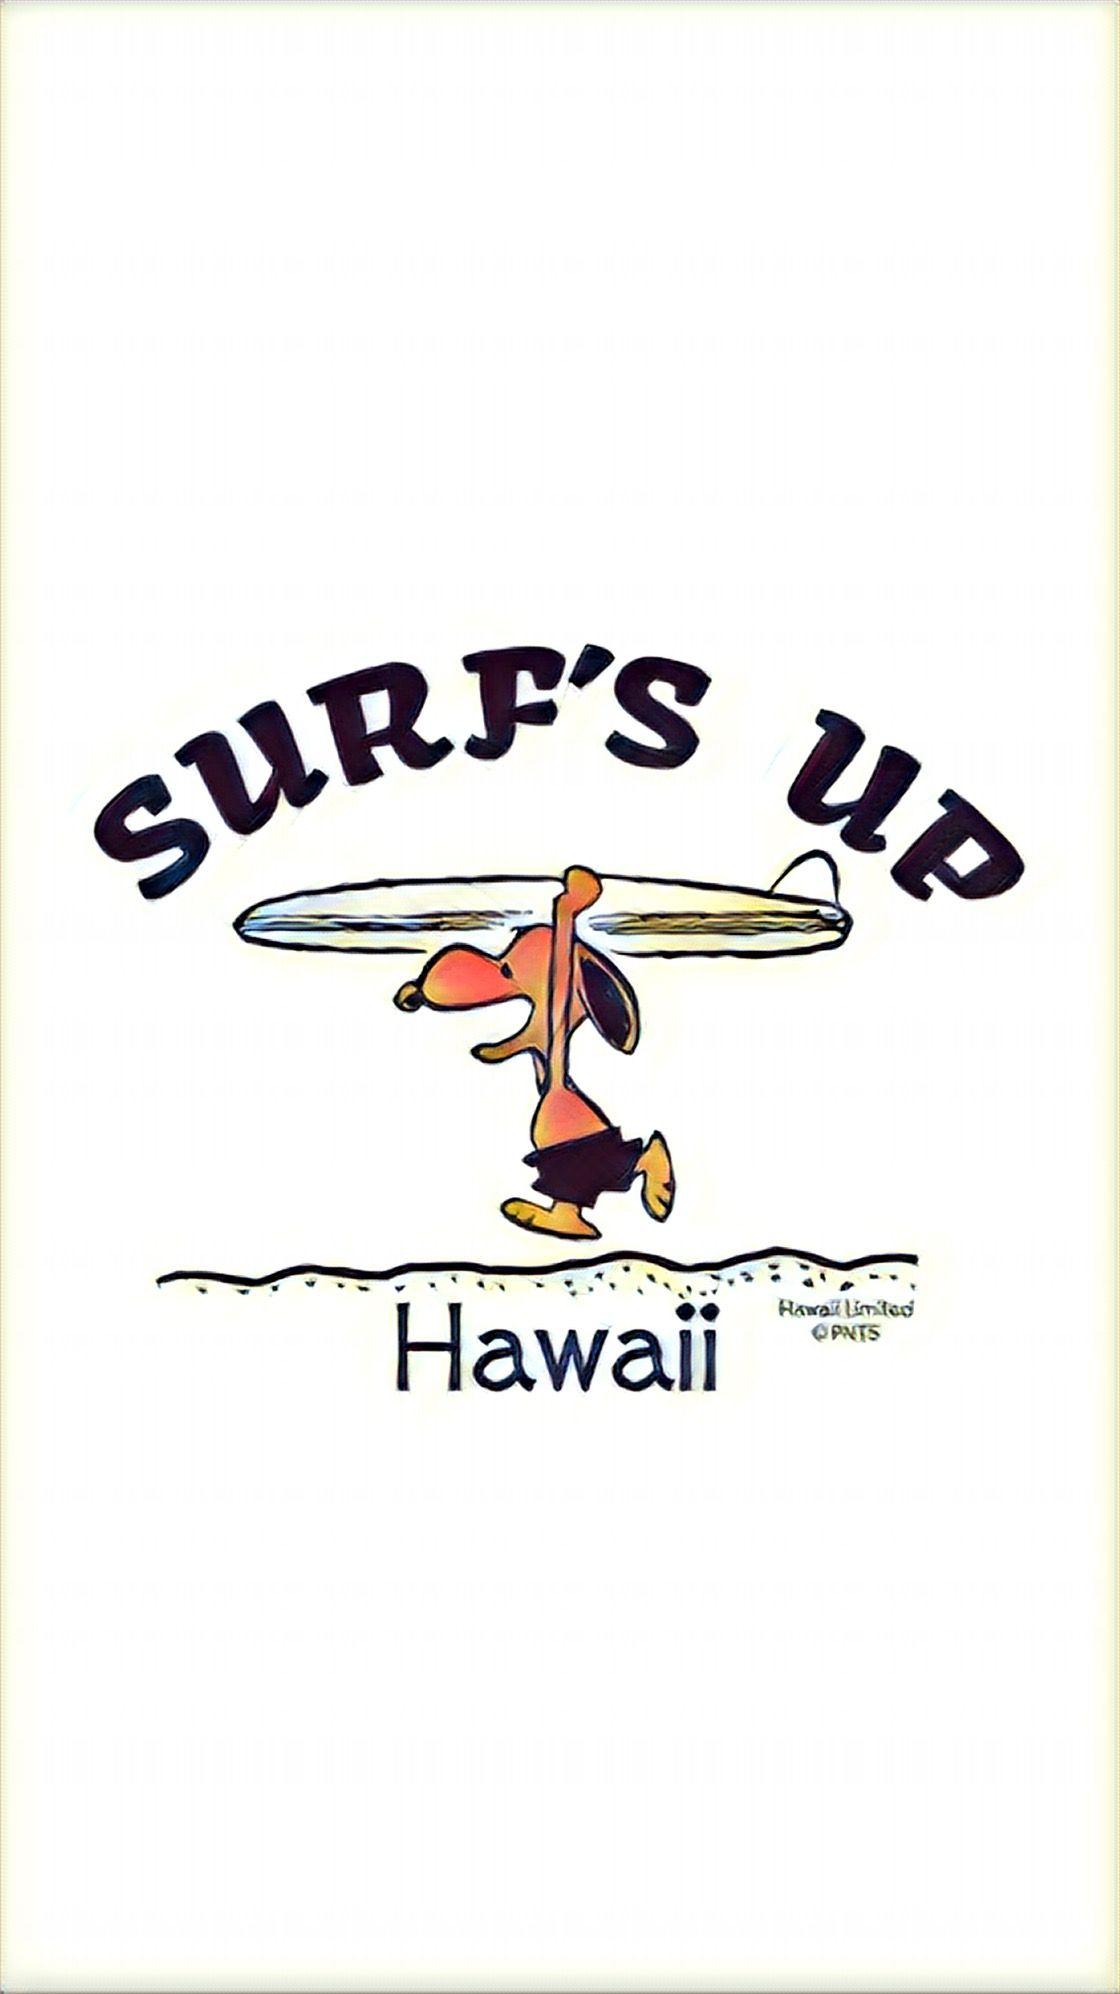 Snoopy Hawaii スヌーピー サーフィン 日焼けスヌーピー スヌーピー